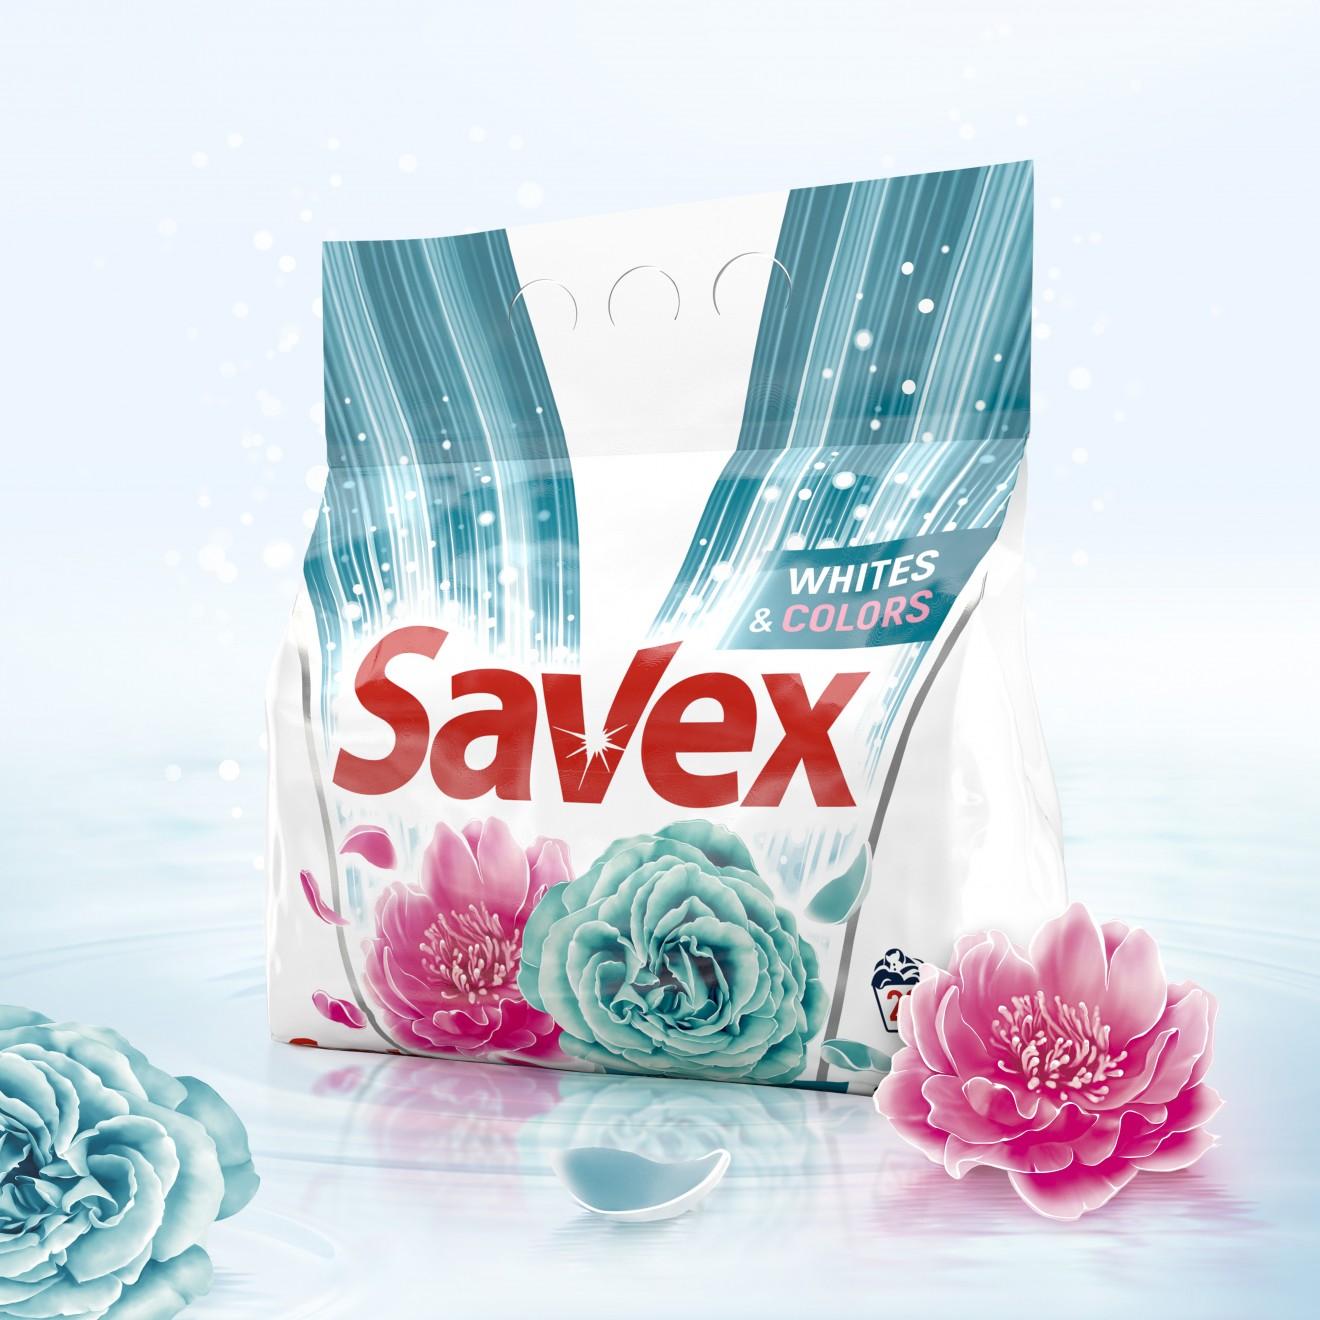 Quatre Mains package design - washing, quatre mains, rebranding